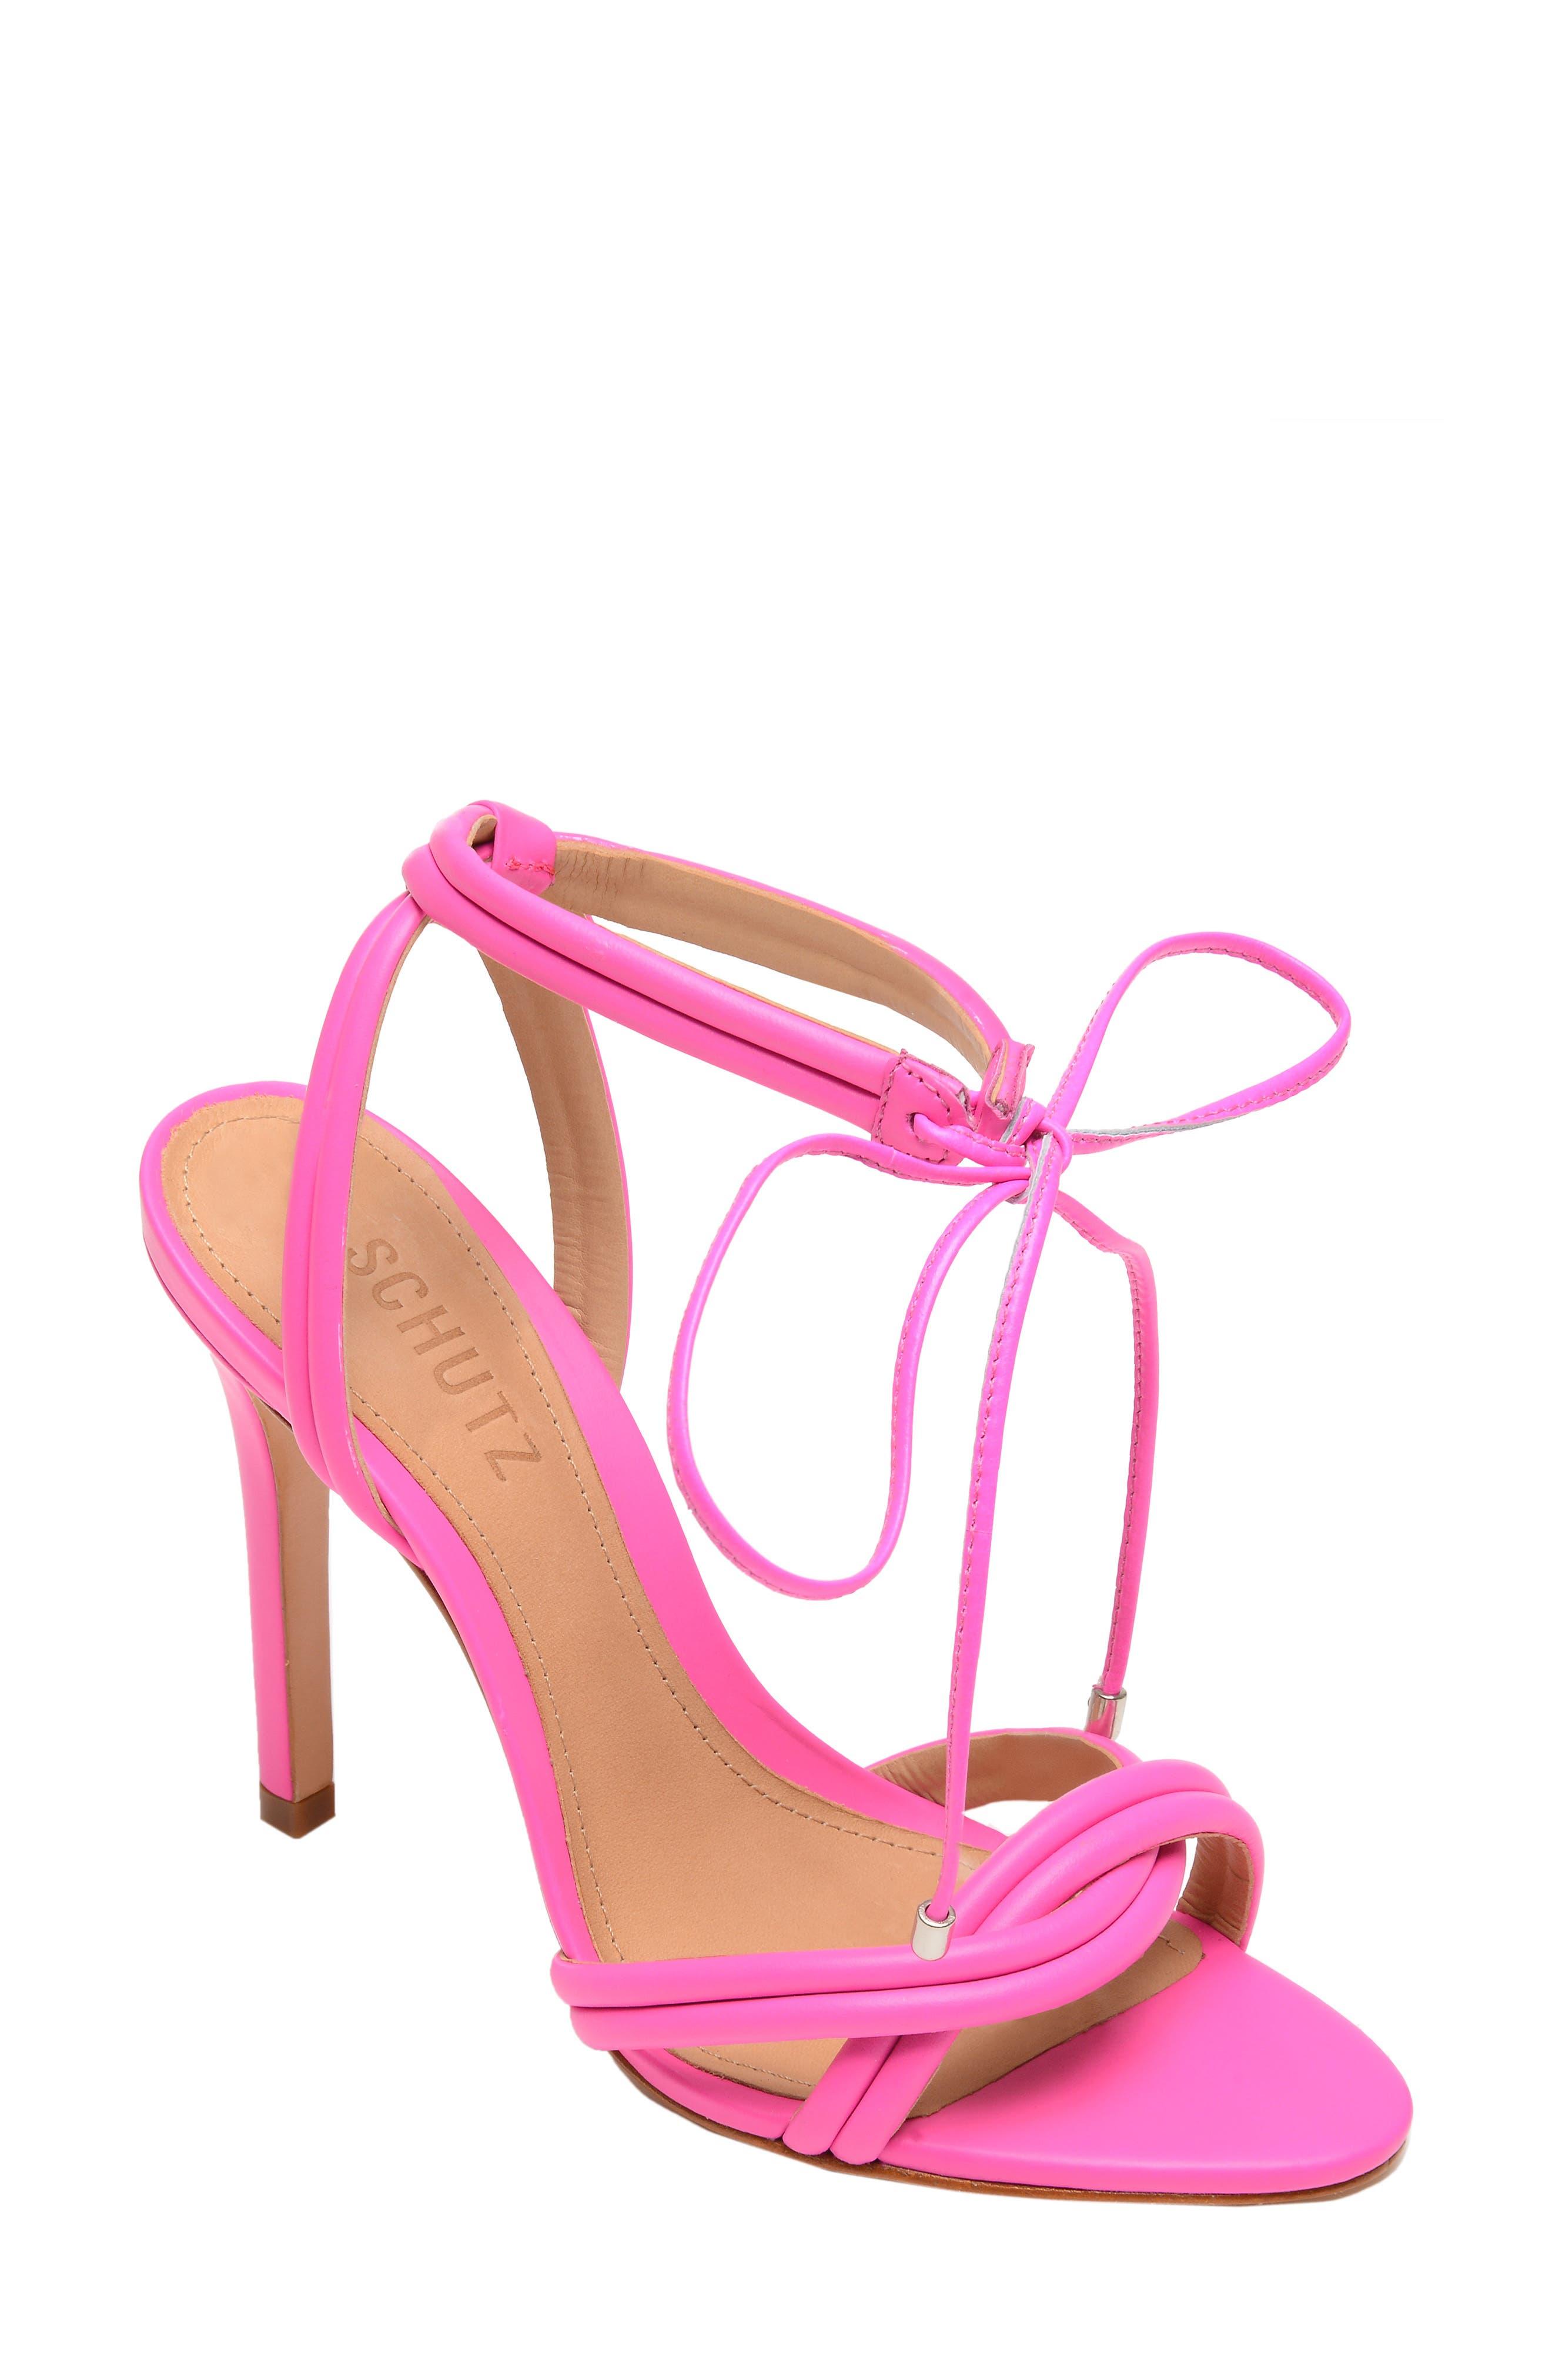 Schutz Yvi Strappy Sandal (Women